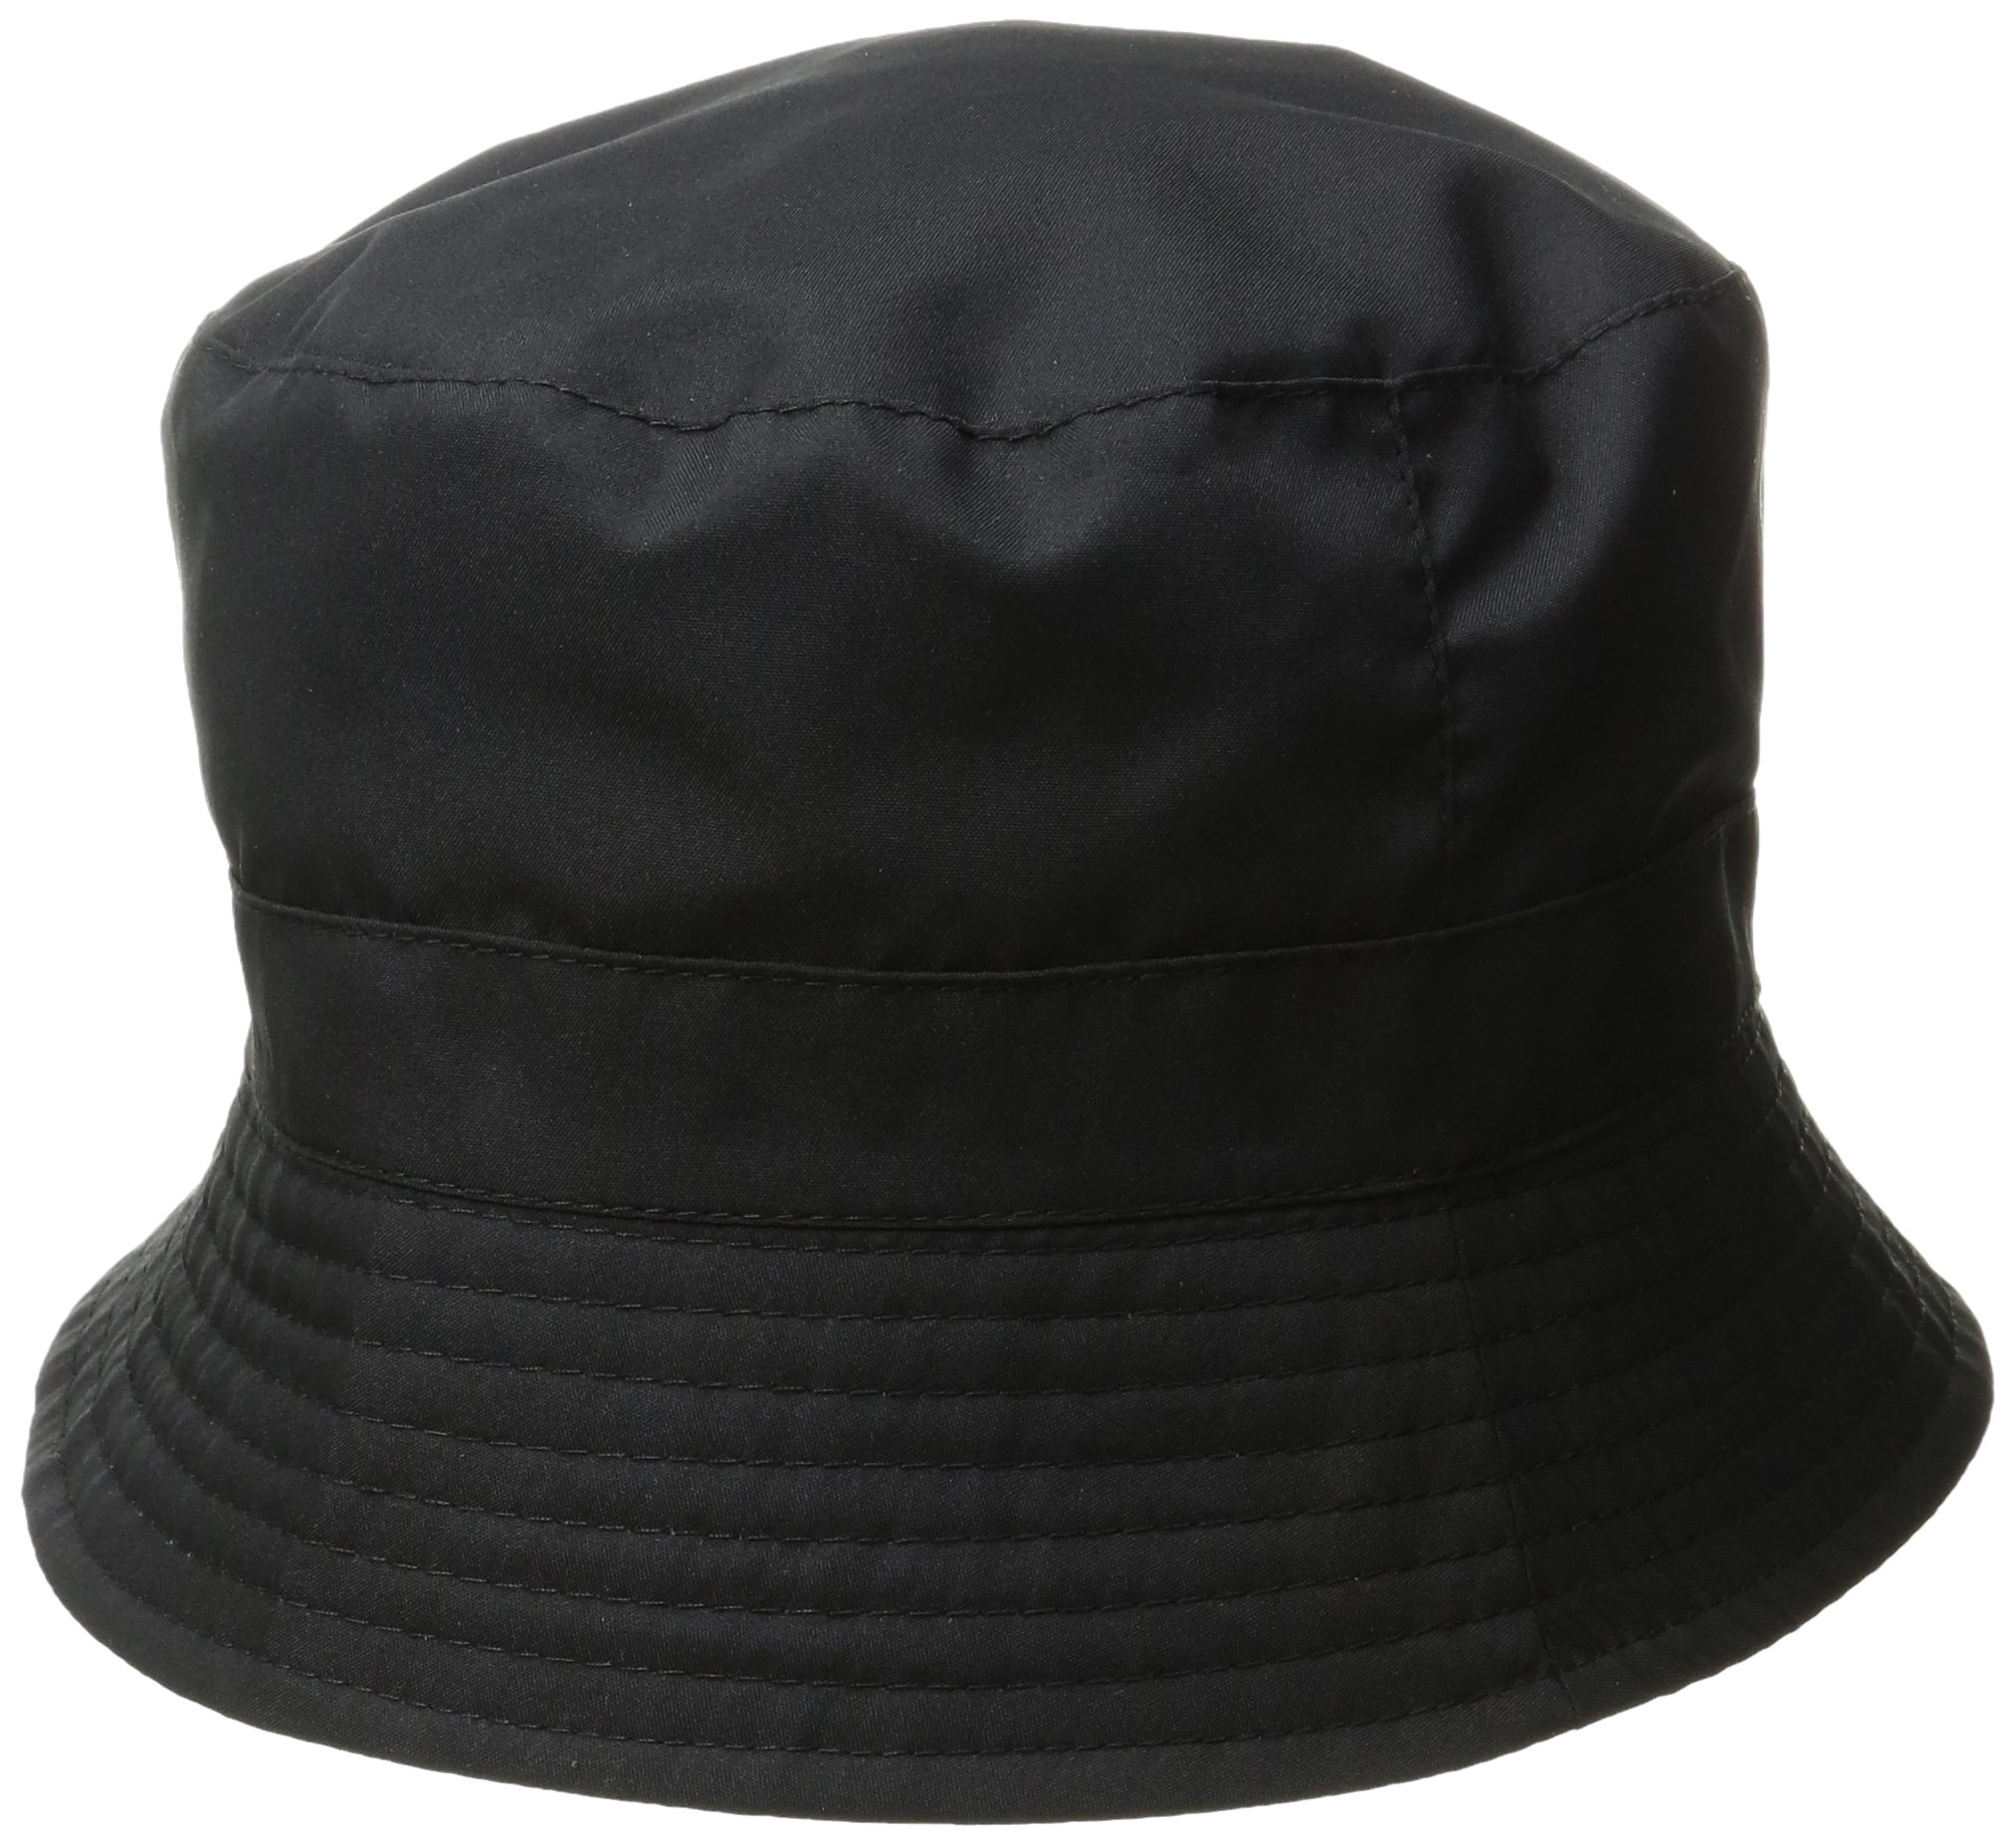 totes Women's Bucket Rain Hat, Black, One Size